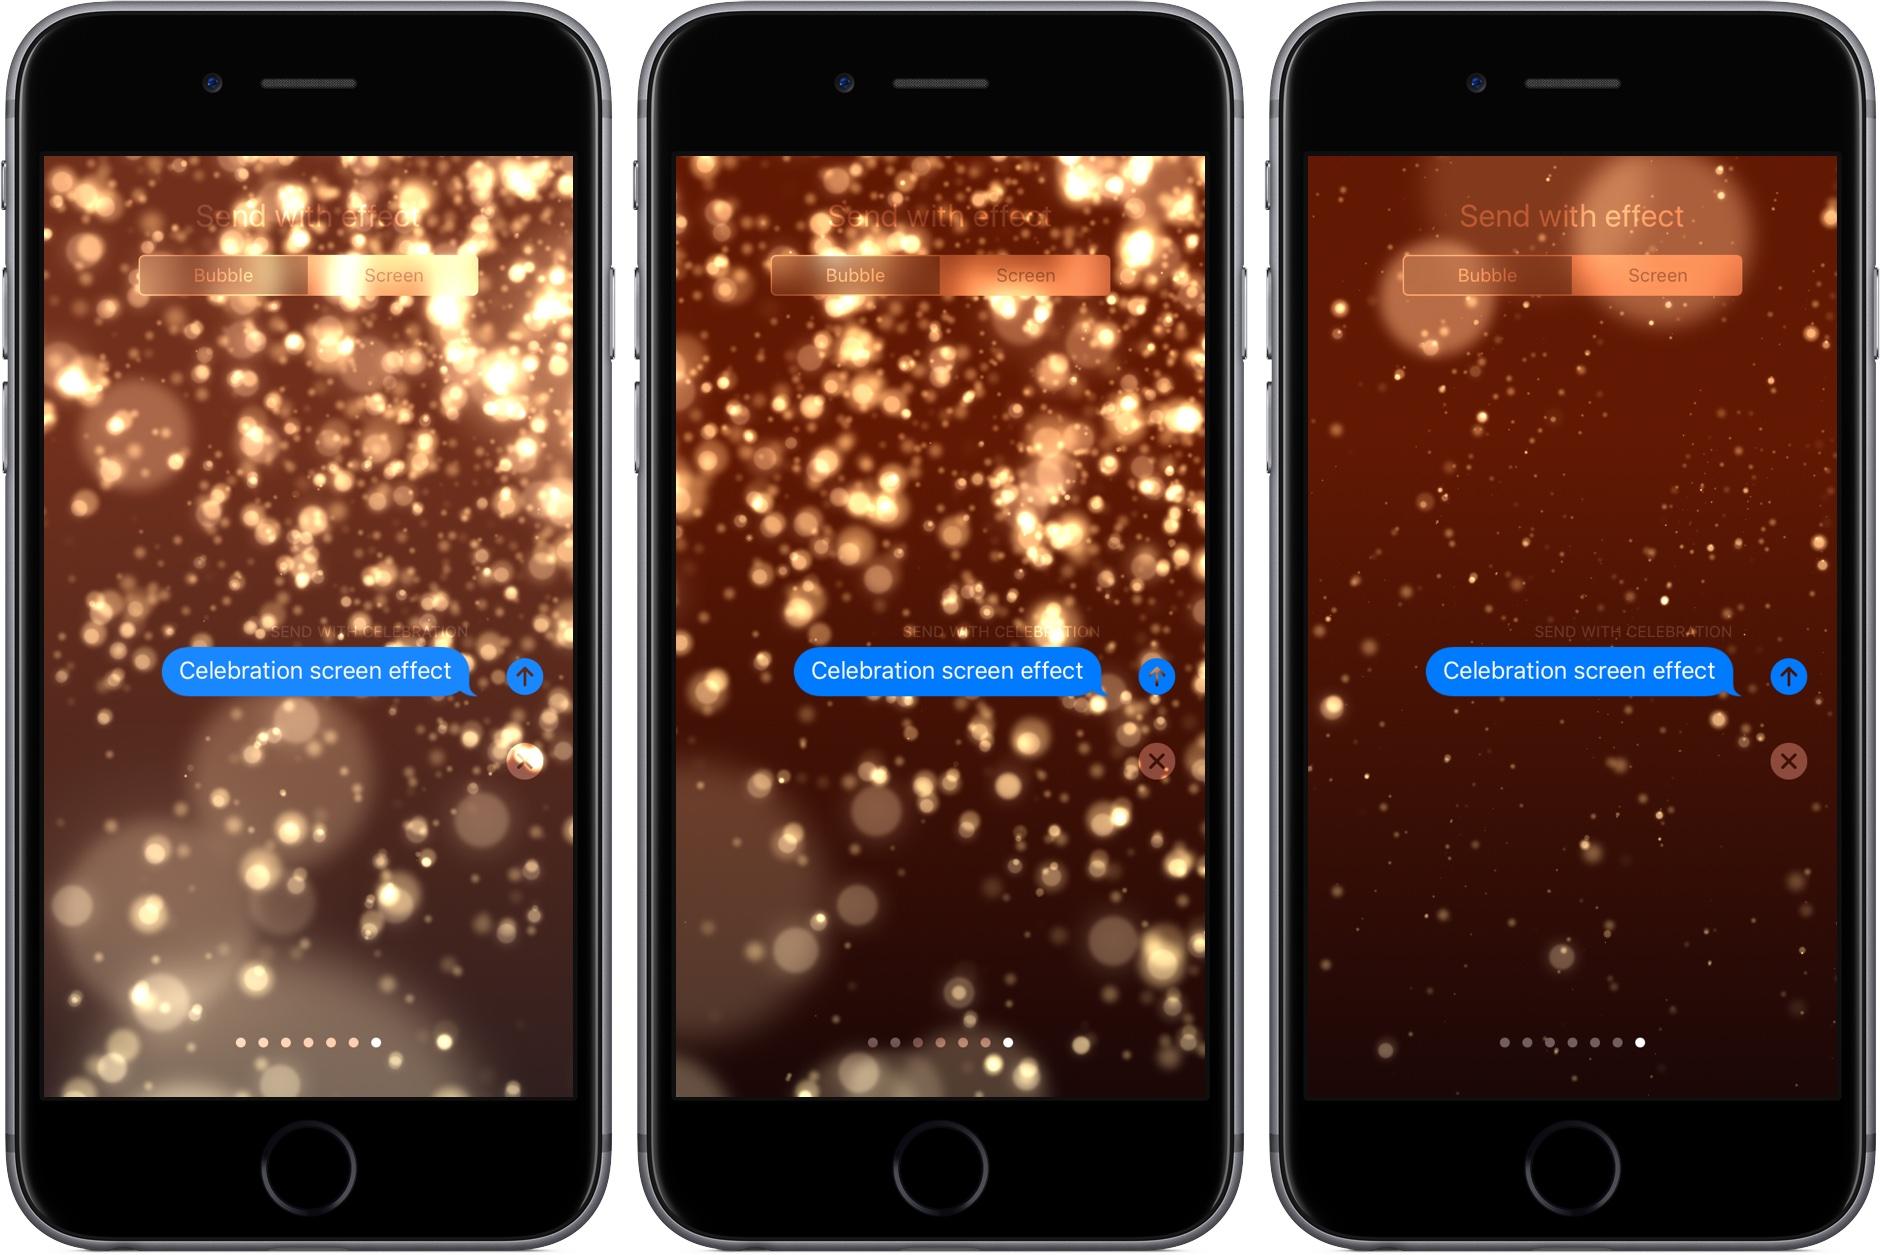 iOS 10.2 Messages Celebration screen effect iPhone screenshot 001